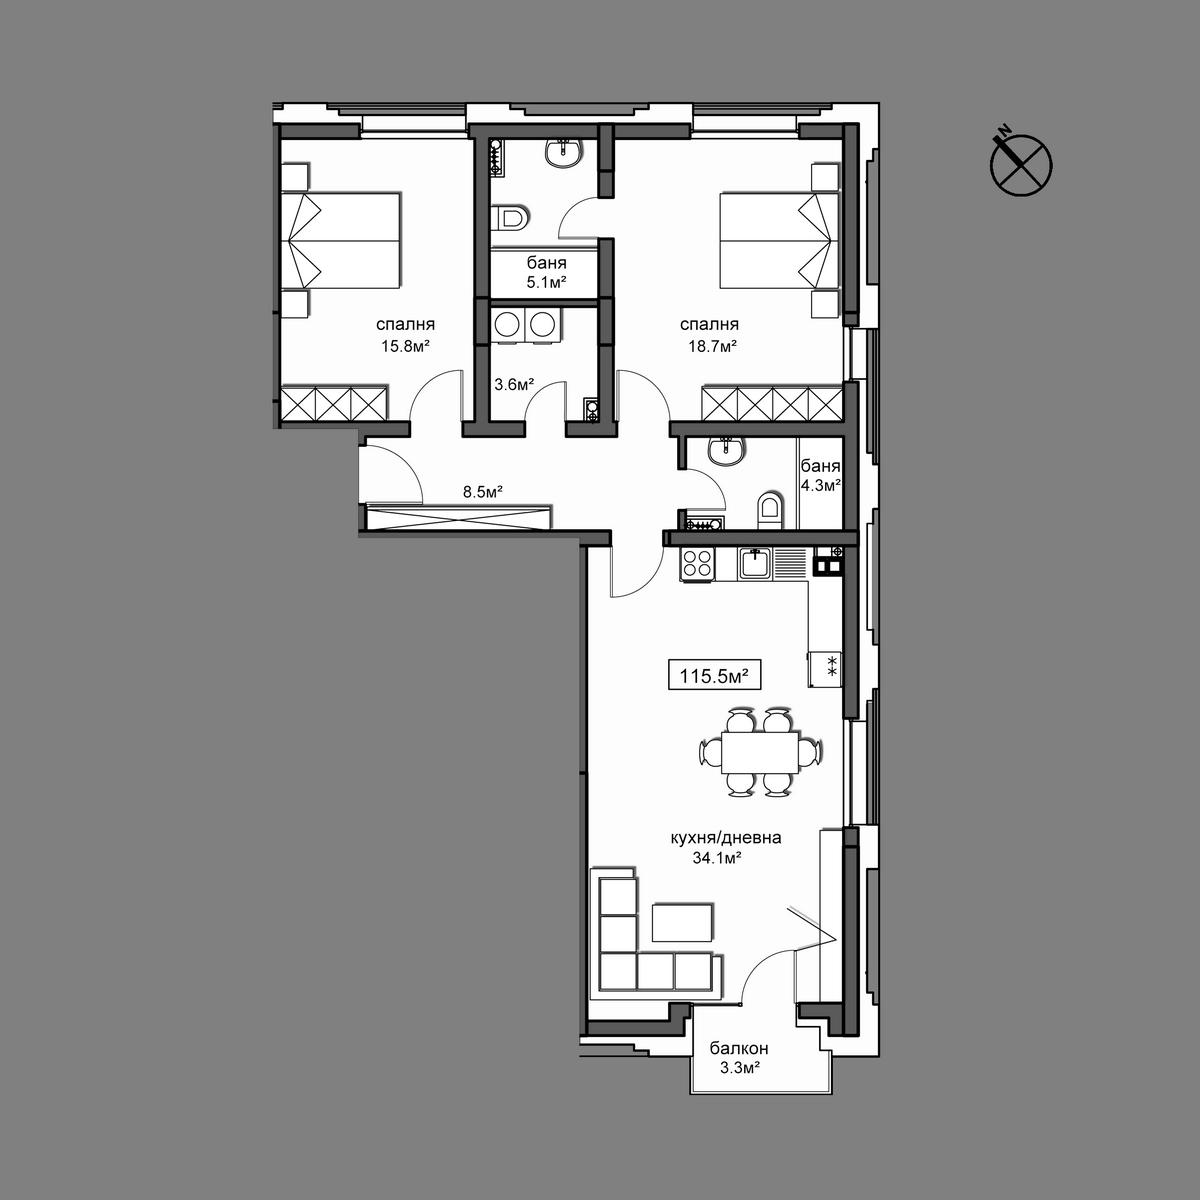 Продава апартамент ново строителство - Апартамент 16